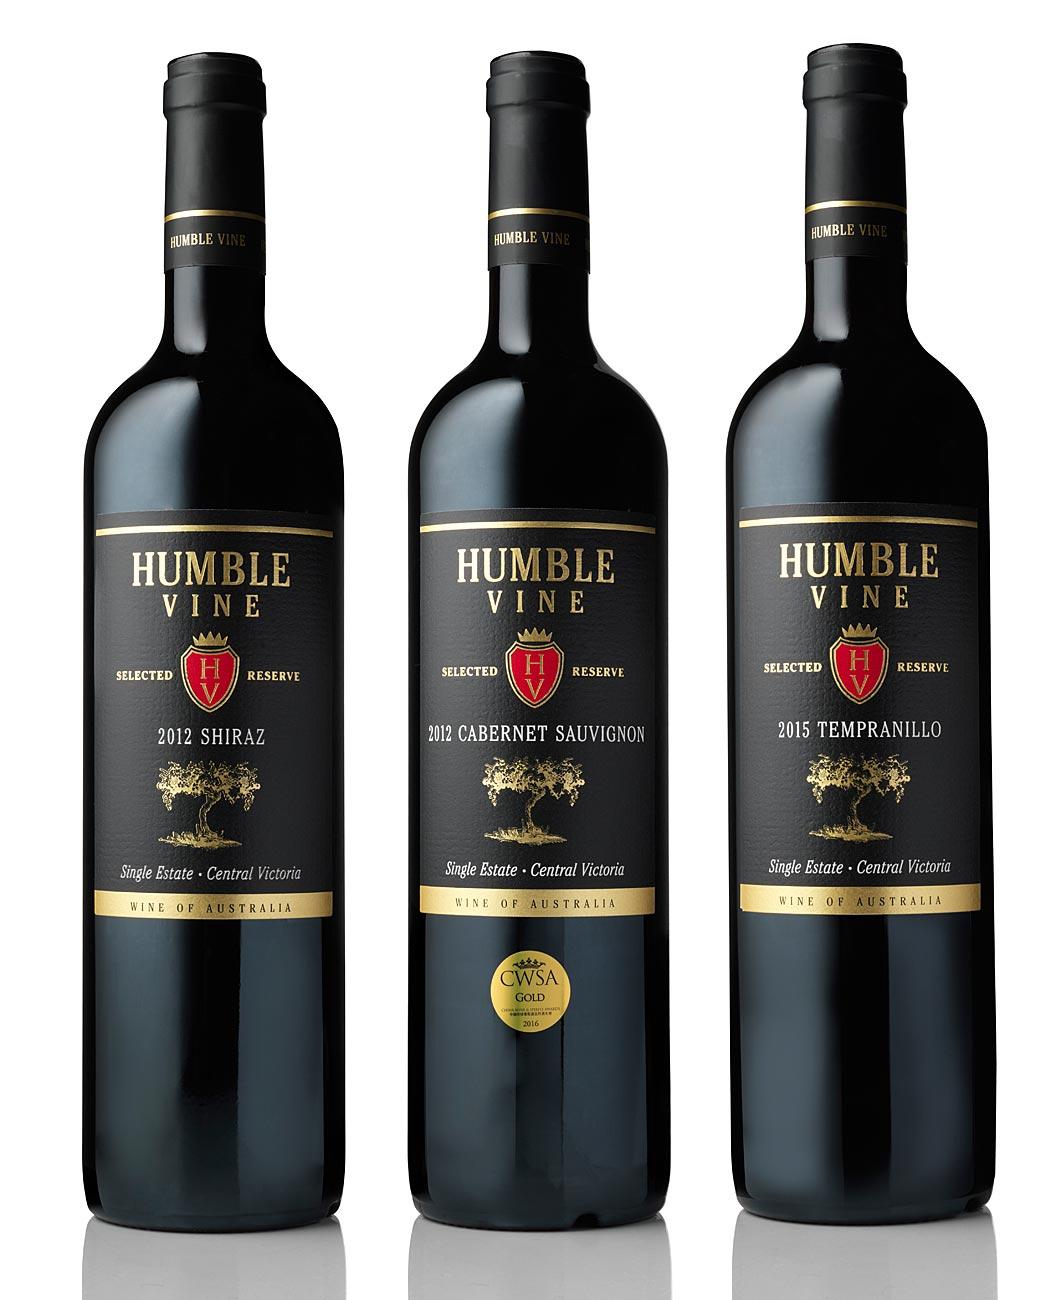 HumbleVine_res-wine-bottle-photography.jpg